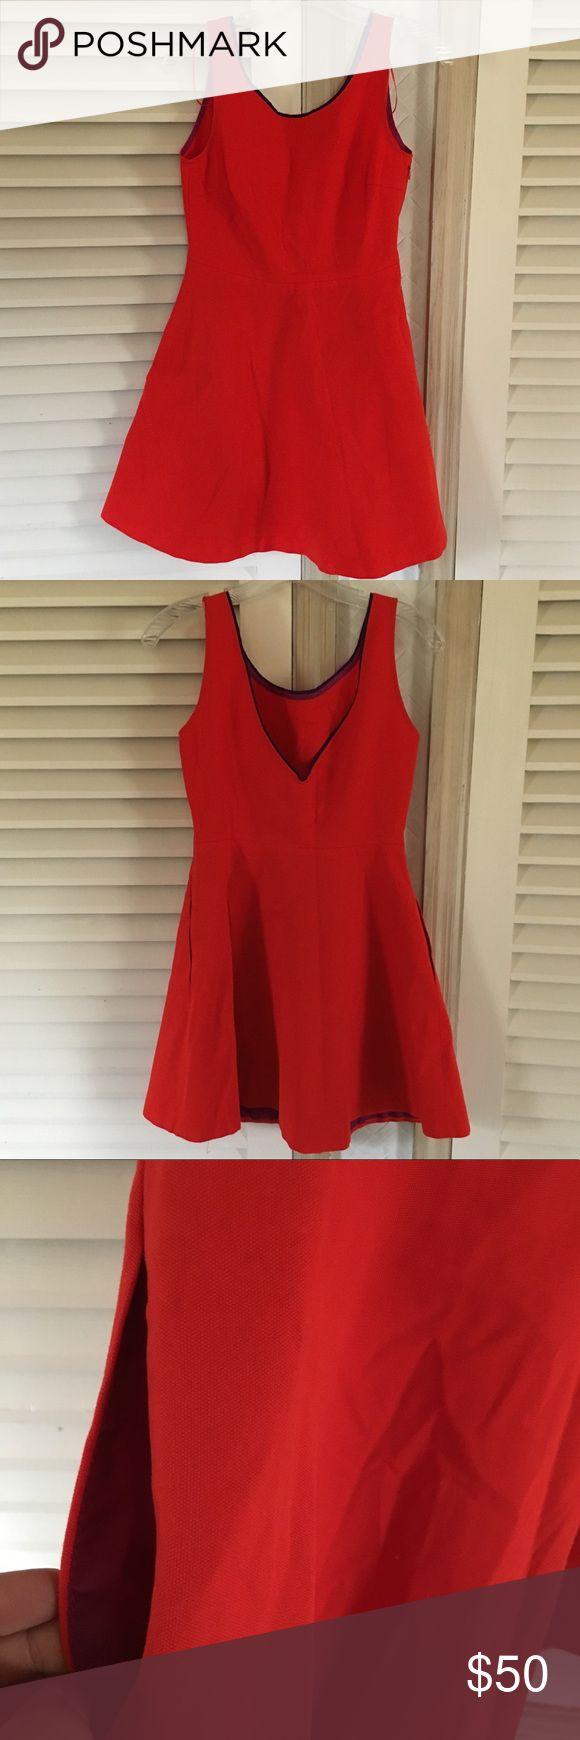 Zara red dress Sorry no trades Zara Dresses